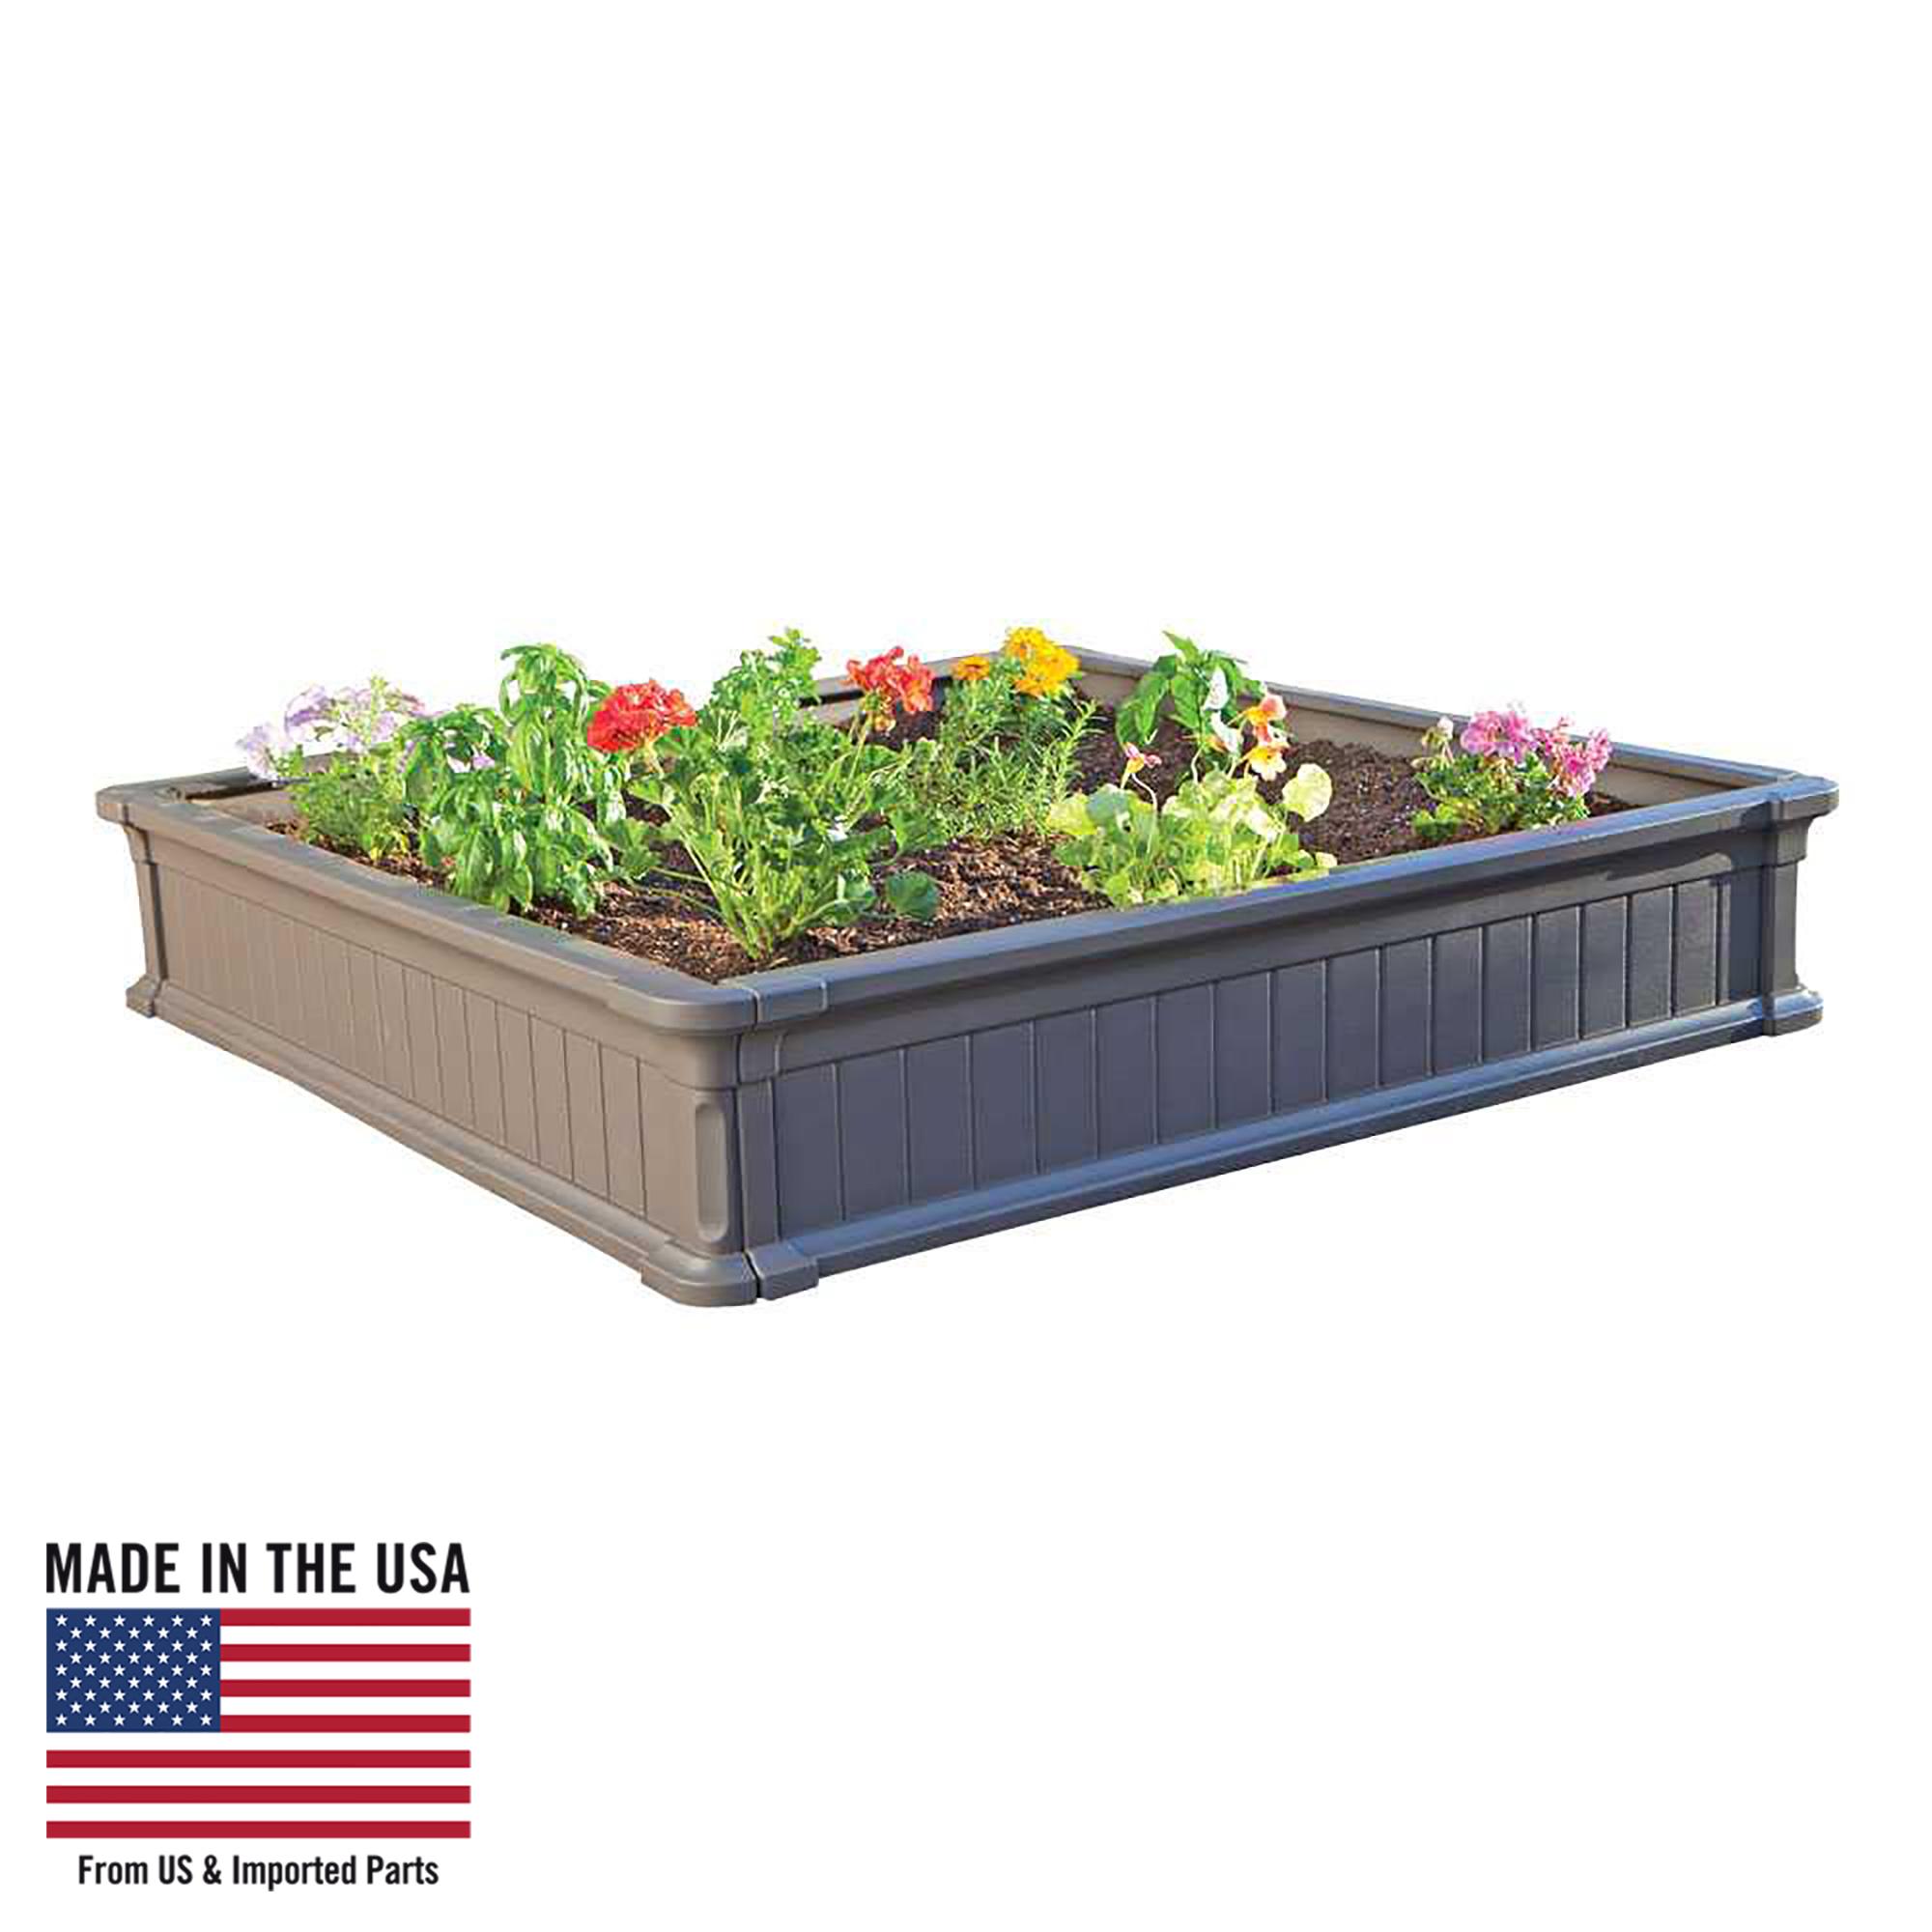 Lifetime 4 ft x 4 ft Raised Garden Bed, Brown, 60065